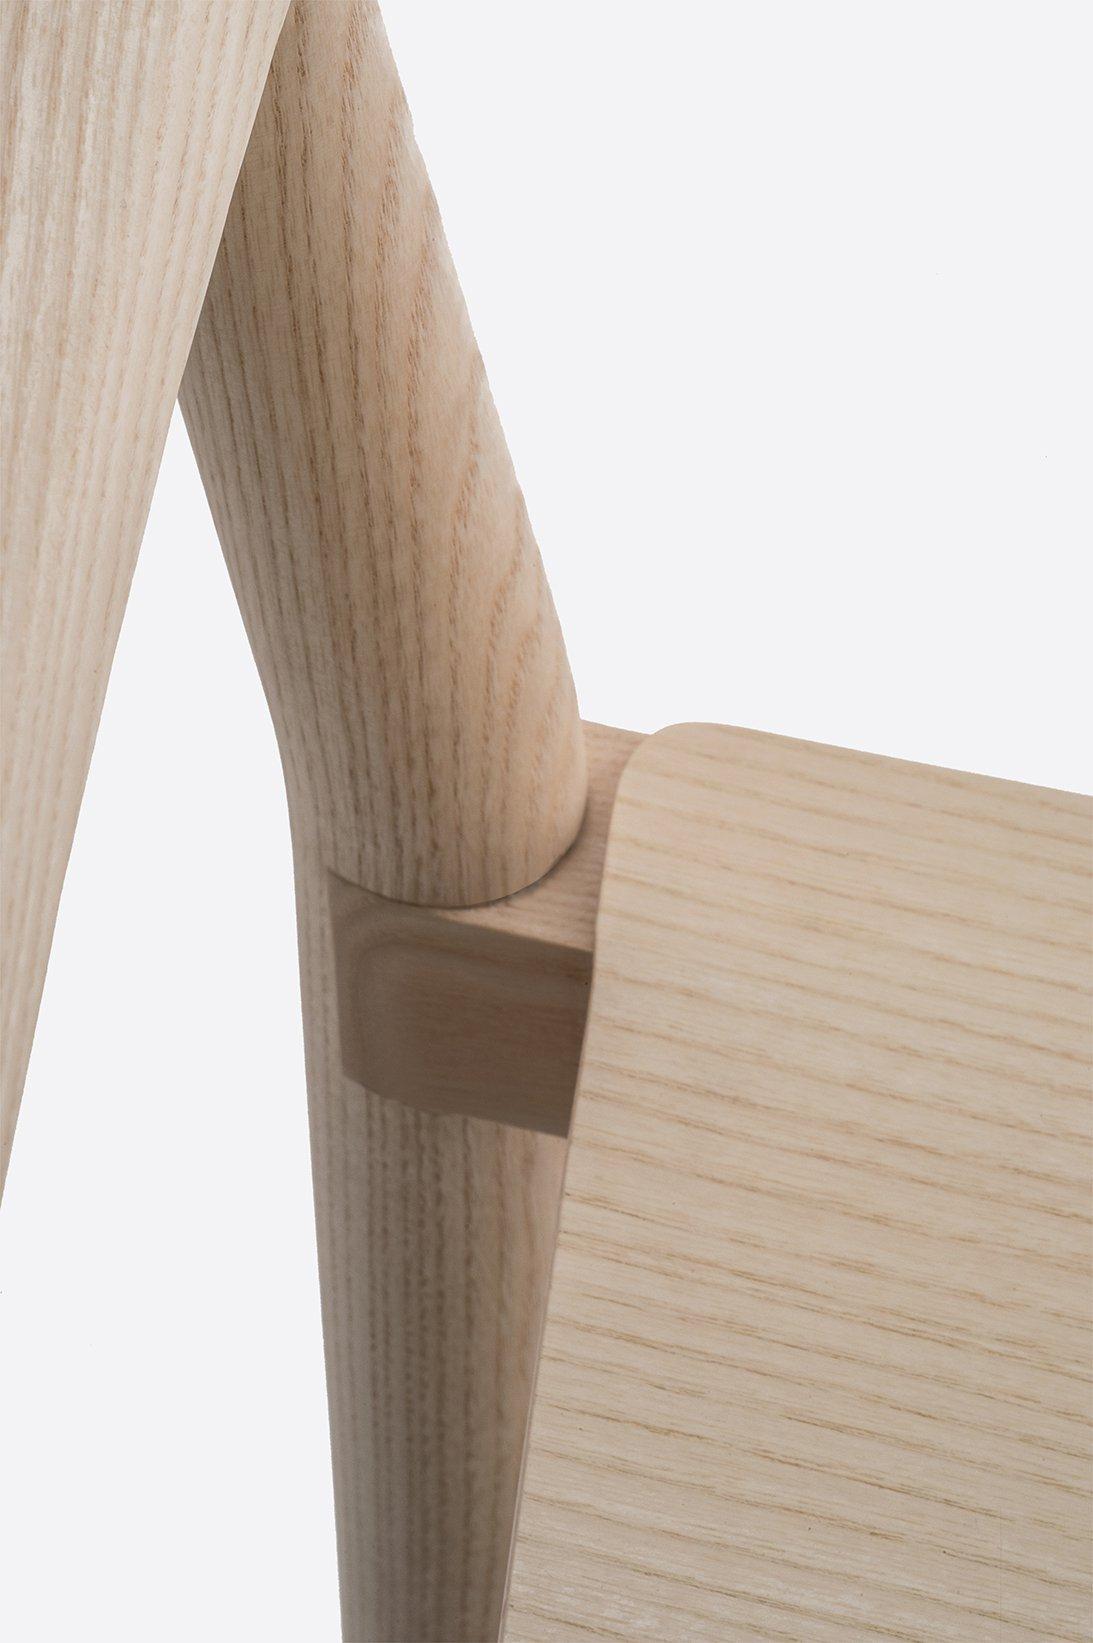 Tivoli chair from Pedrali, designed by CMP Design